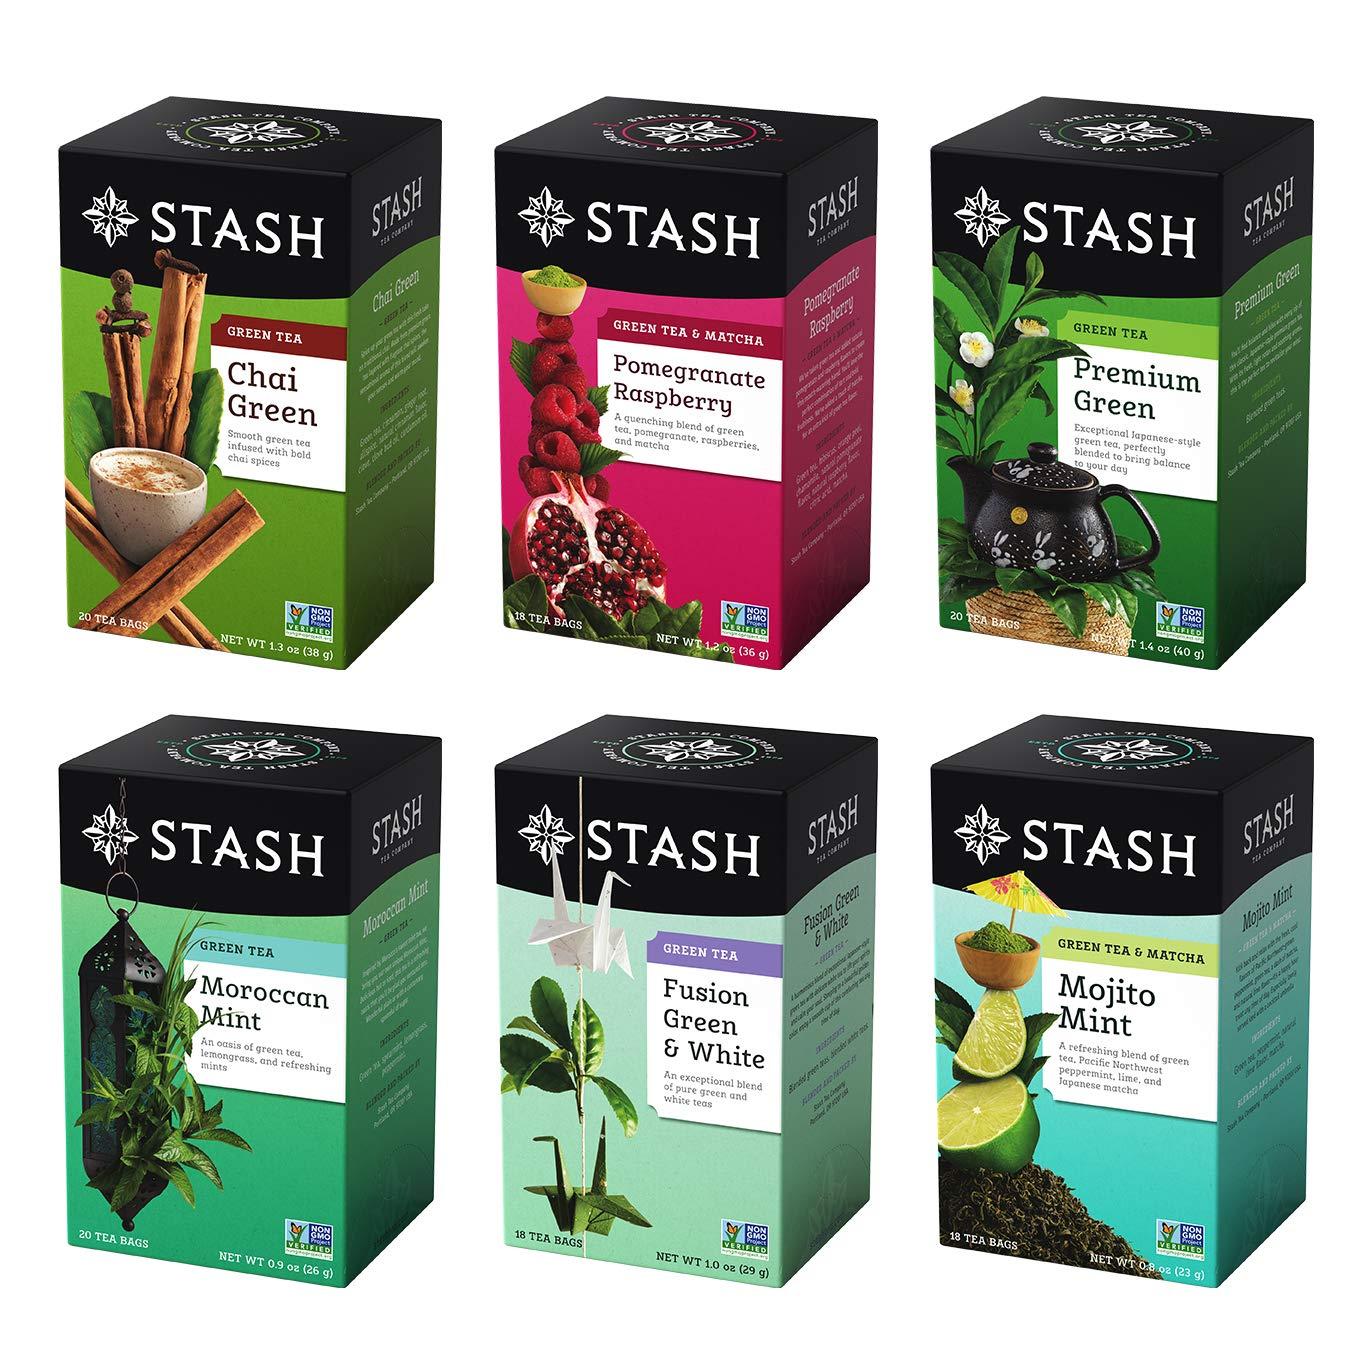 Stash Tea Green Tea Six Flavor Assortment,18-20 Count Tea Bags in Foil (Pack of 6)